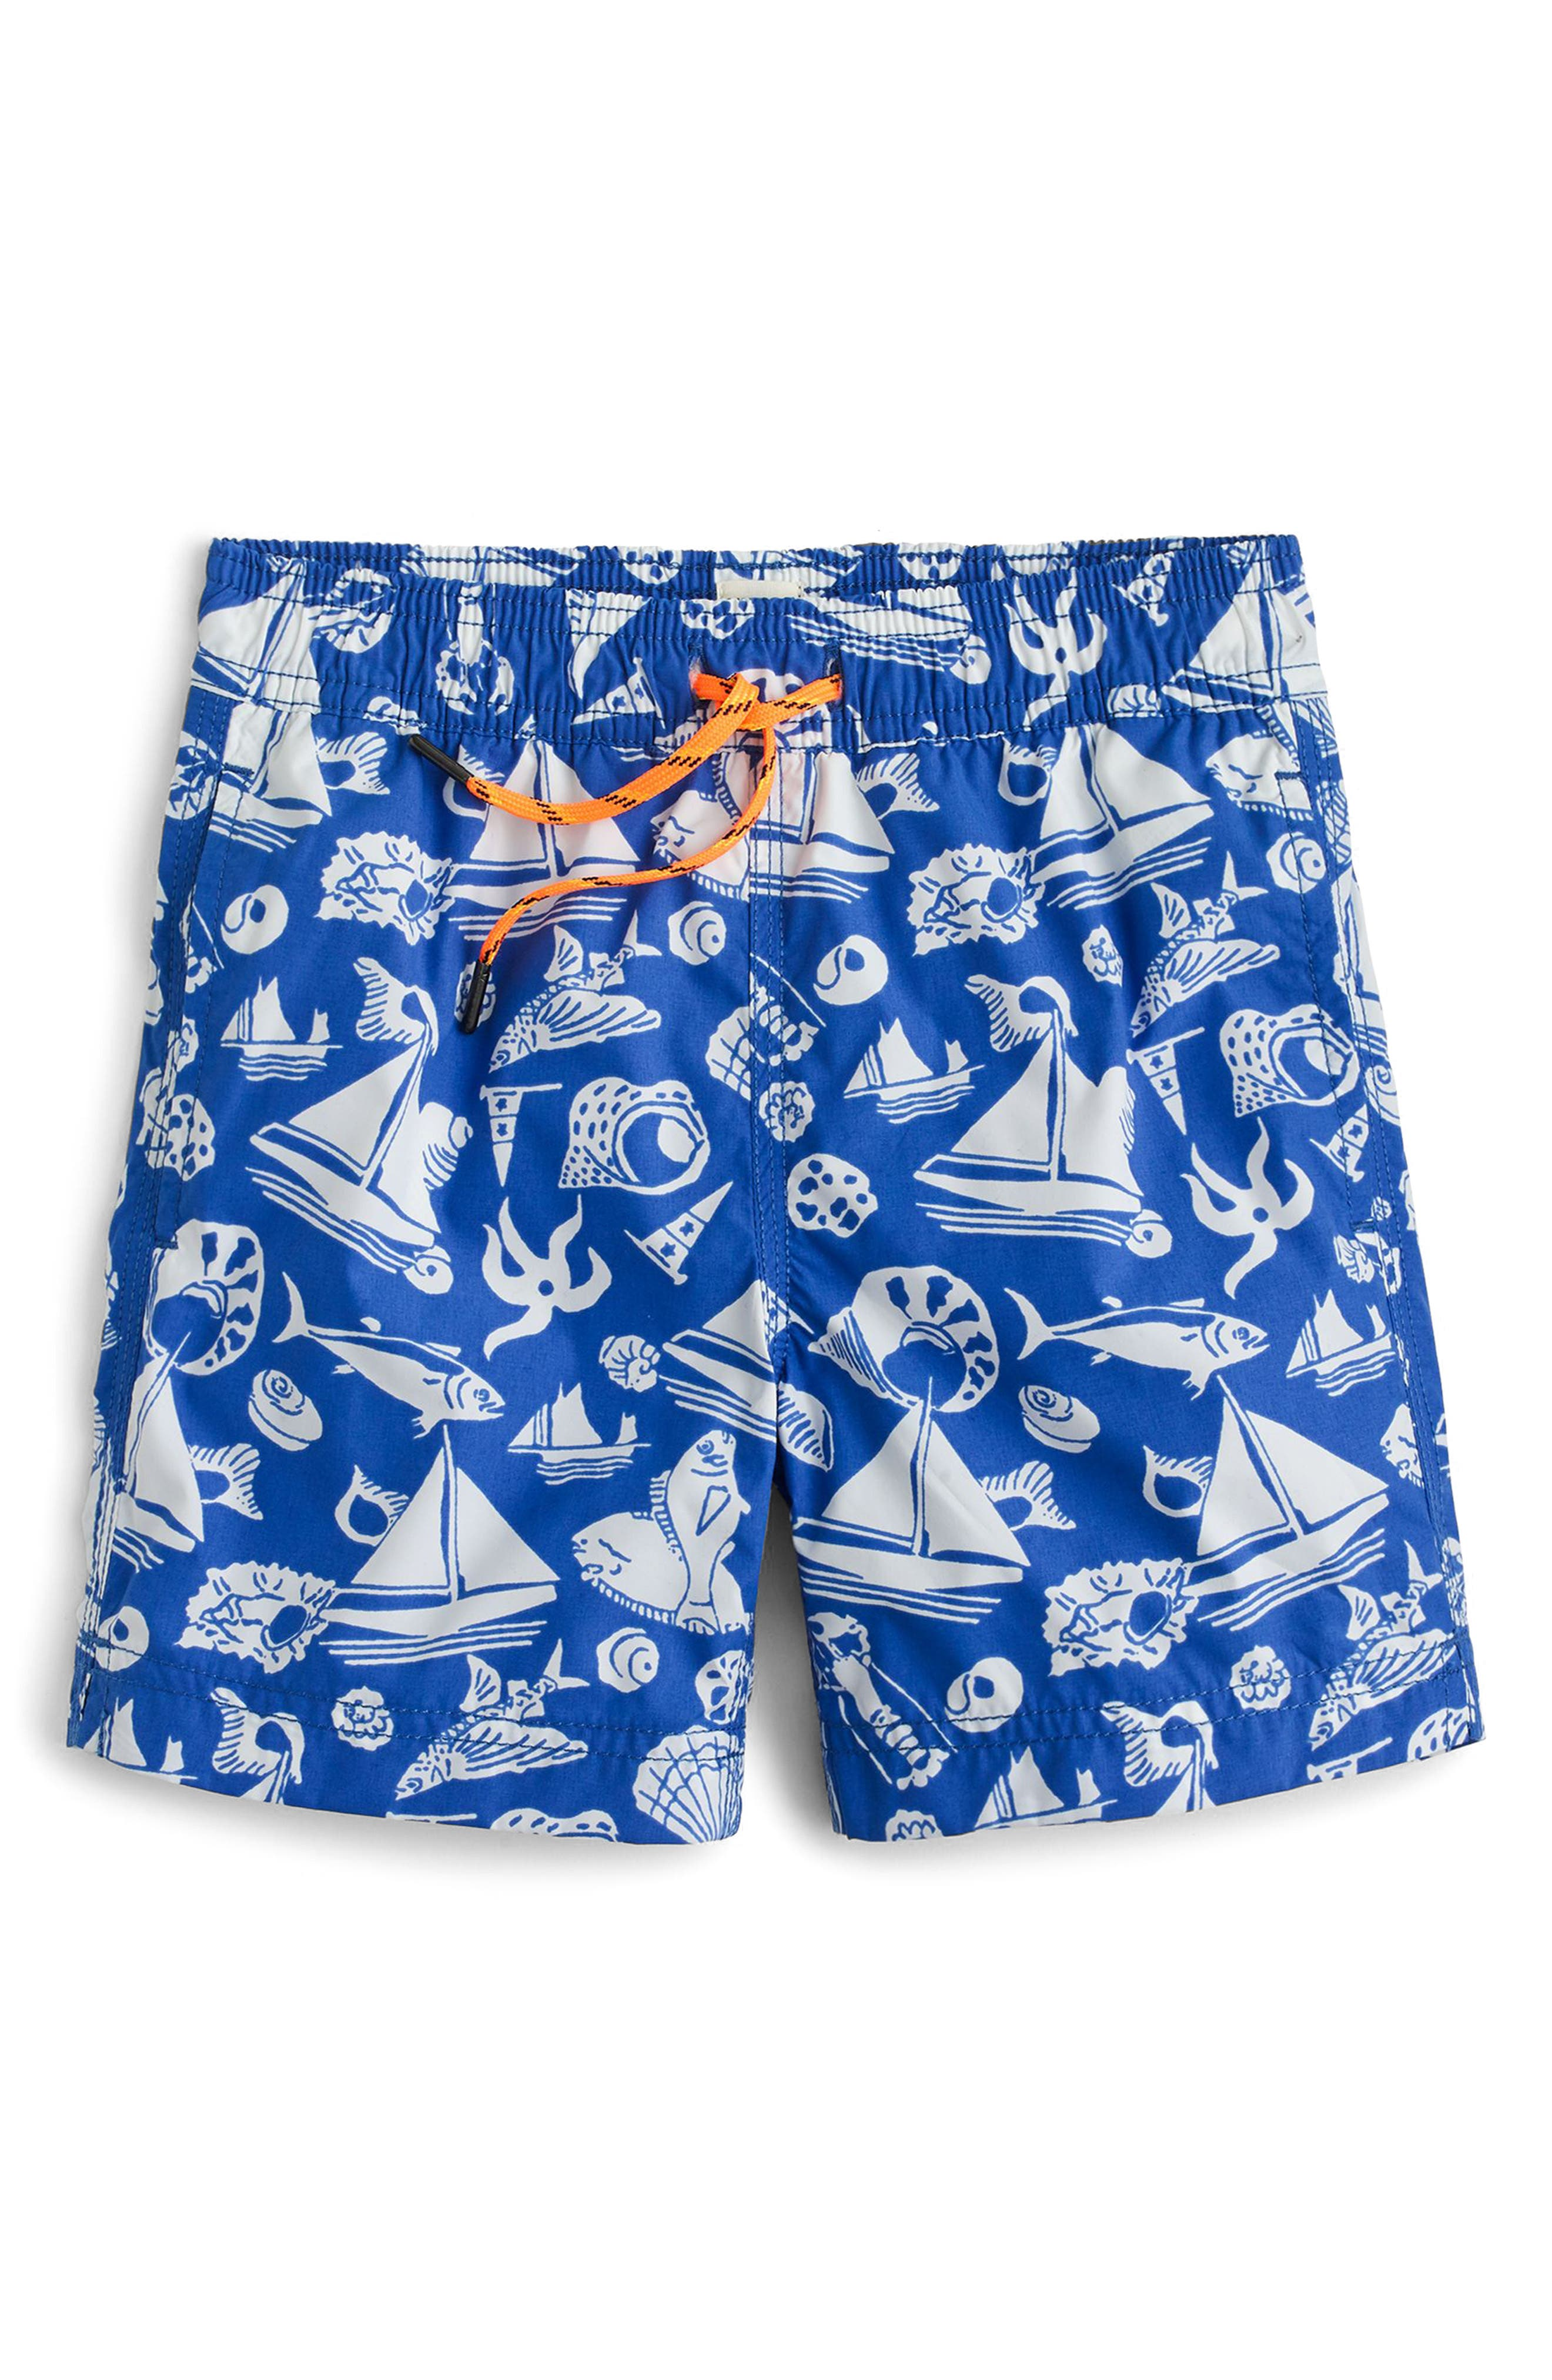 crewcuts by J.Crew Seaside Life Swim Trunks (Toddler Boys, Little Boys & Big Boys)